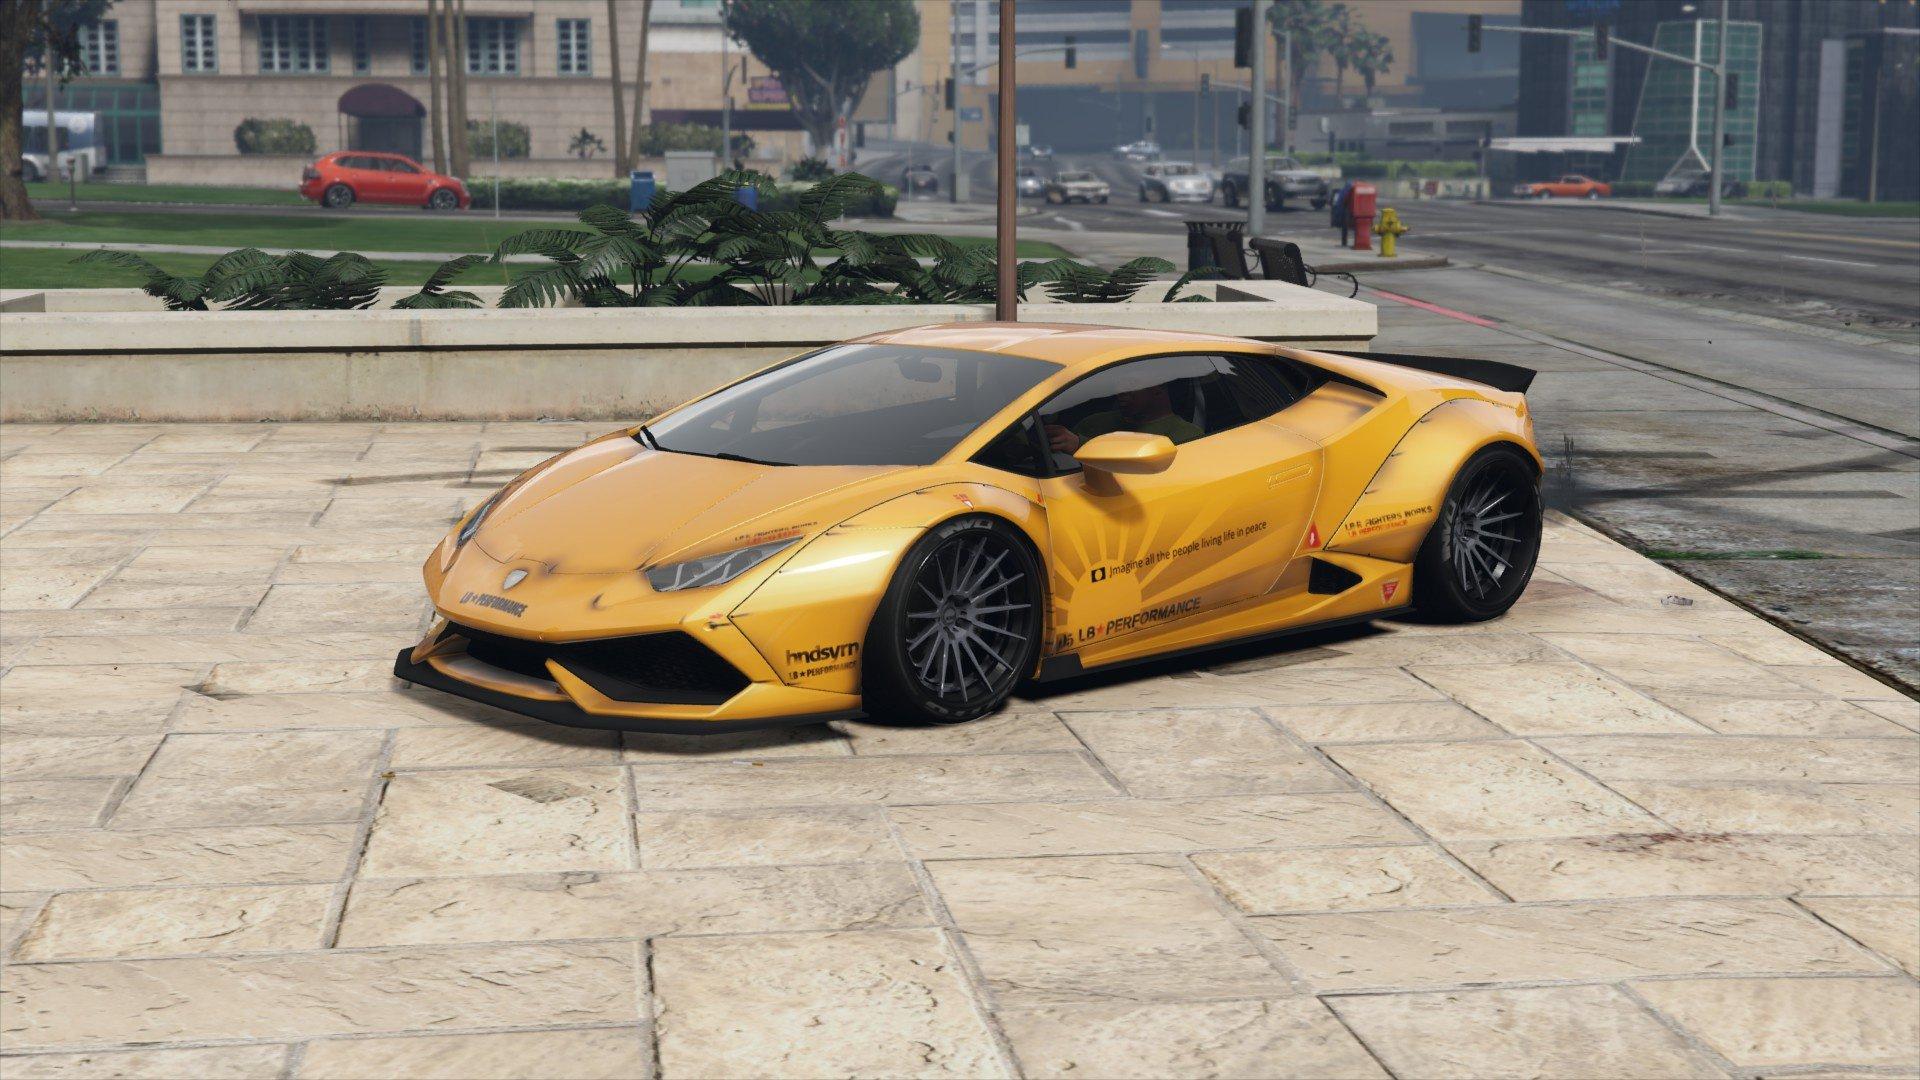 a4b566-20171015233019_1 Elegant Lamborghini Huracan forza Horizon 2 Cars Trend